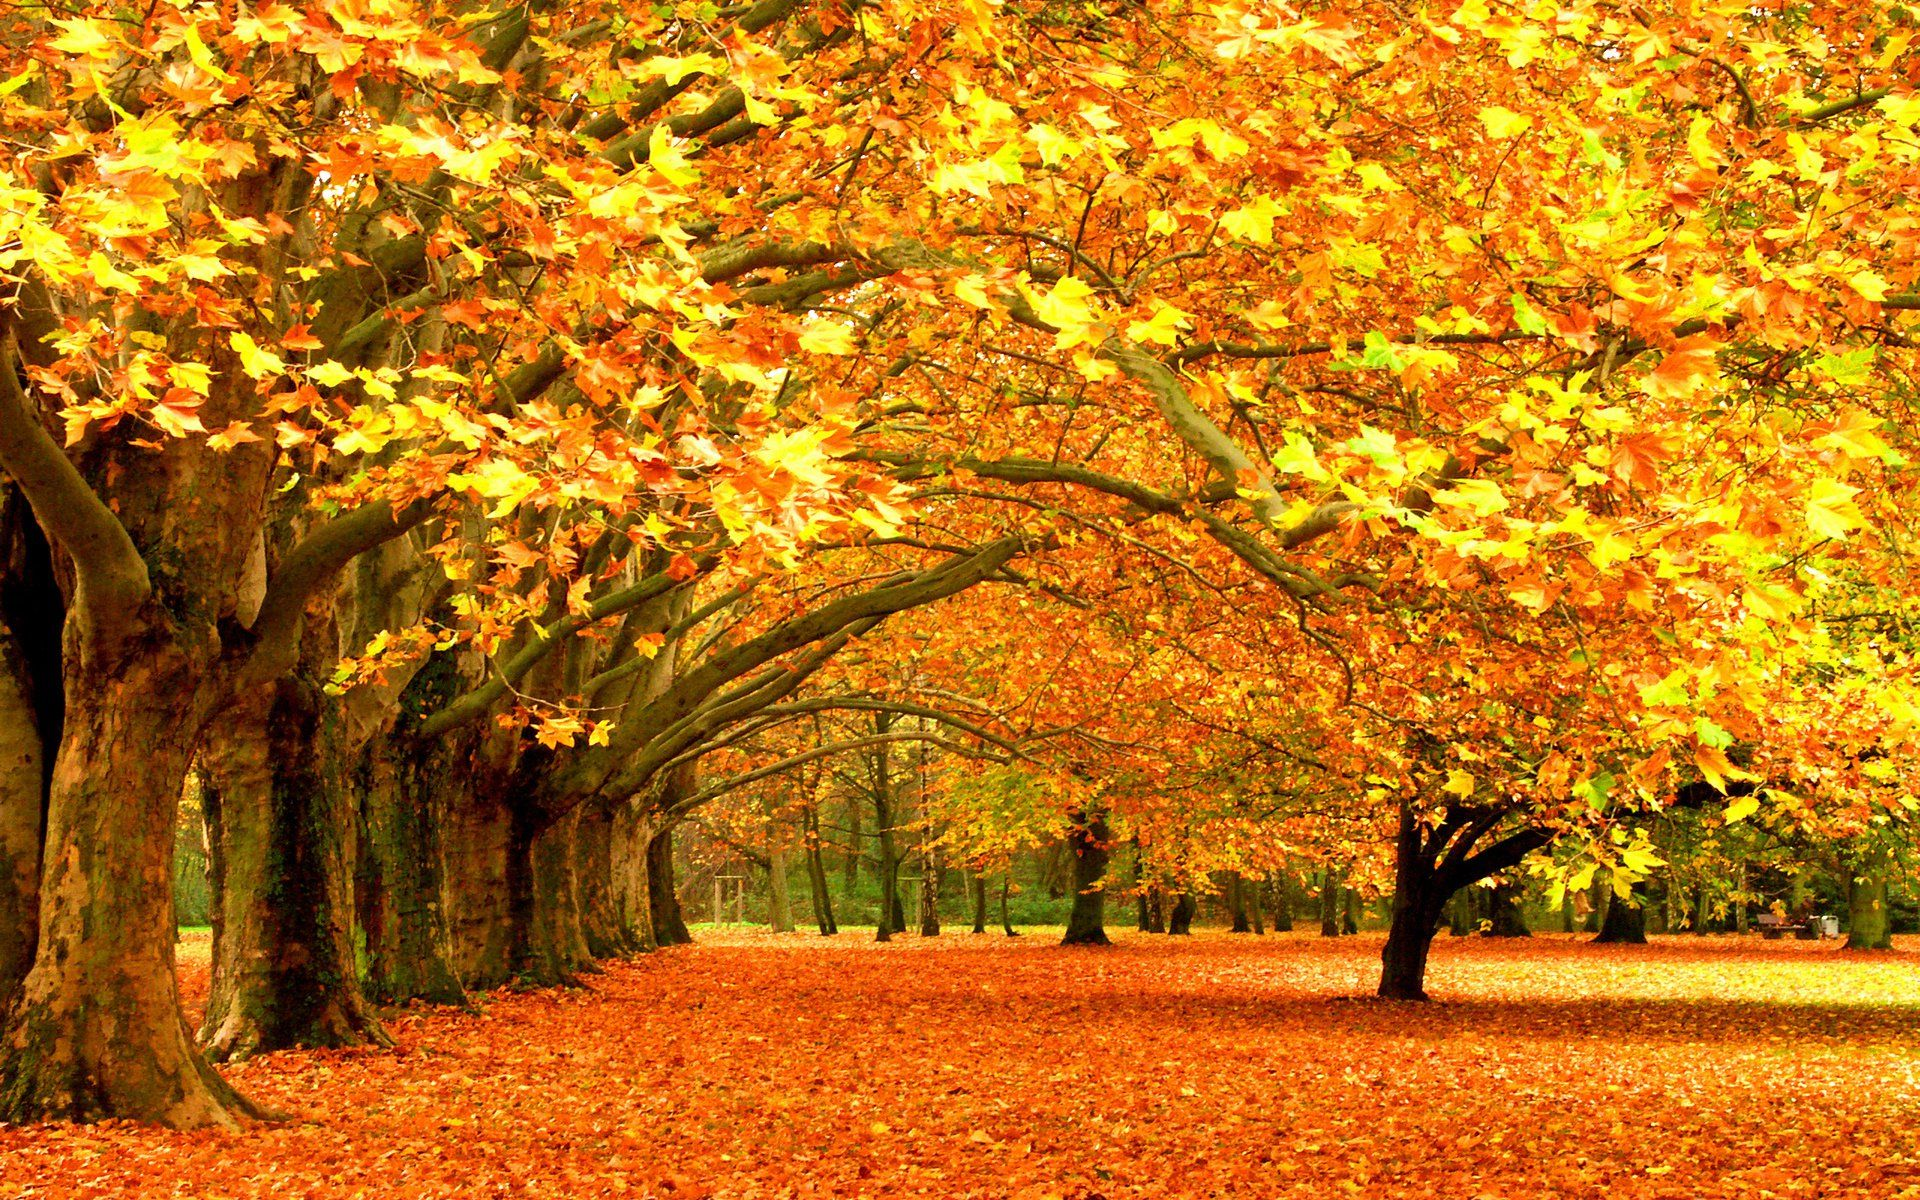 Fall Autumn Foliage Trees Wallpapers 1920x1200 2461500 Autumn Trees Landscape Scenery